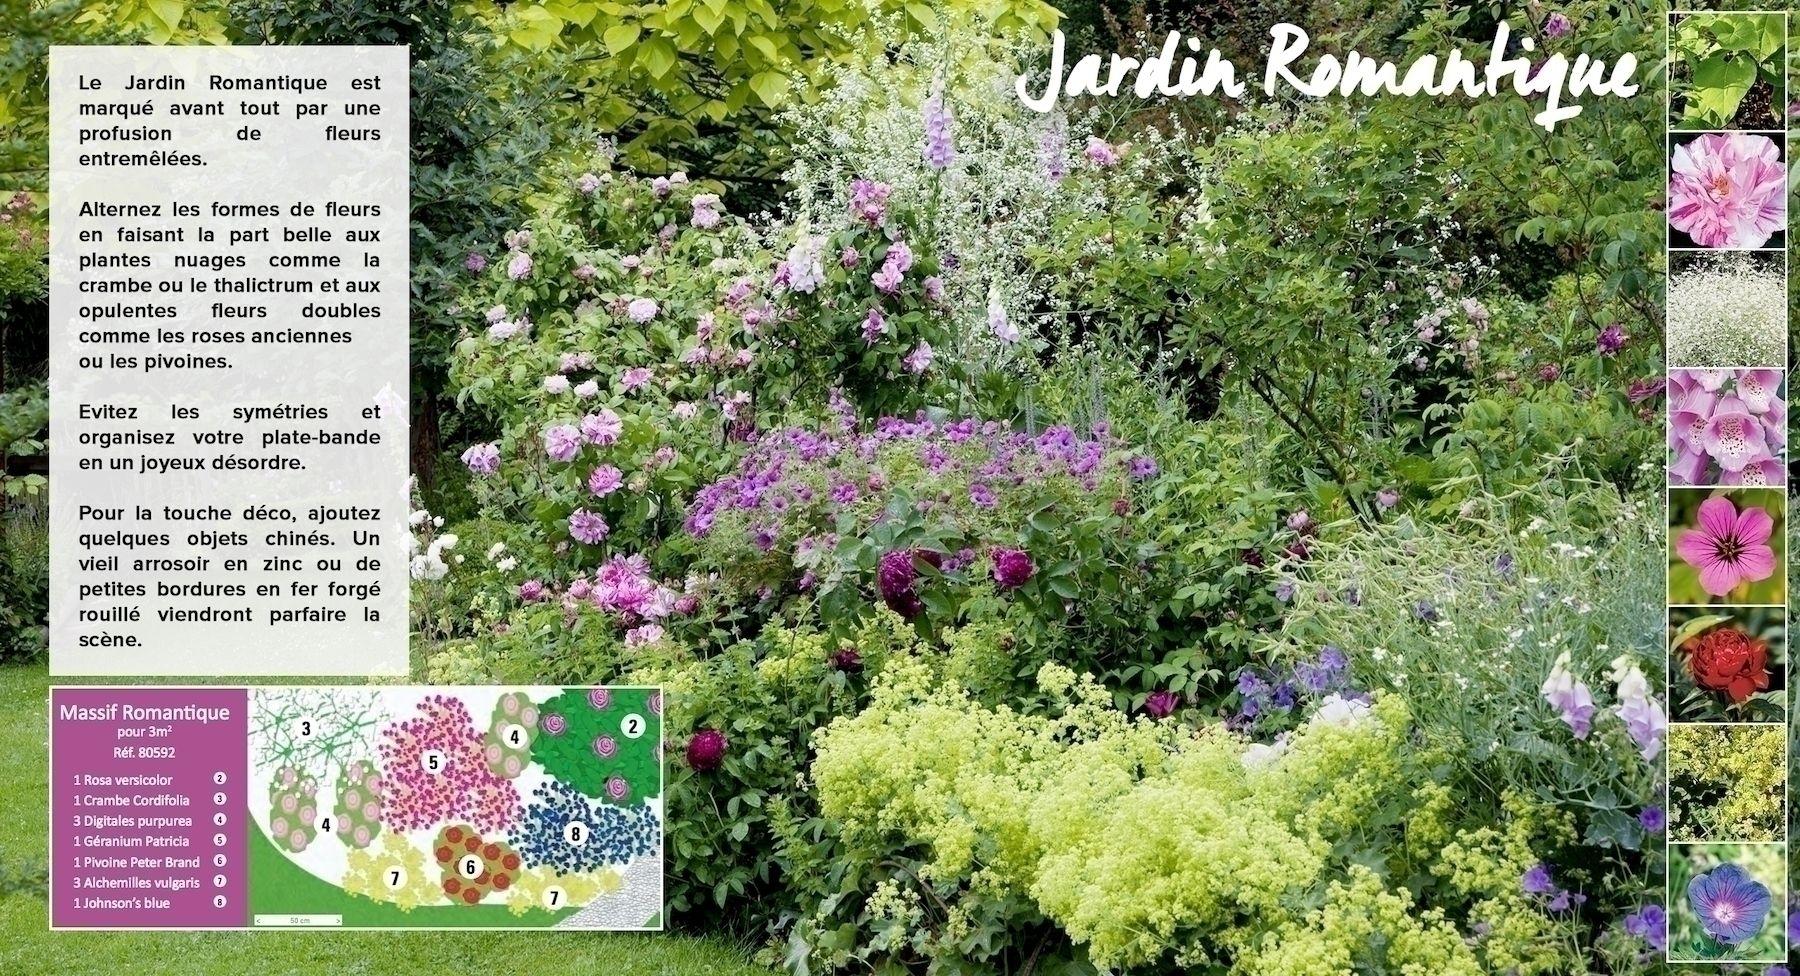 Massif Romantique | vrt 7 | Jardin romantique, Jardins et Idées jardin